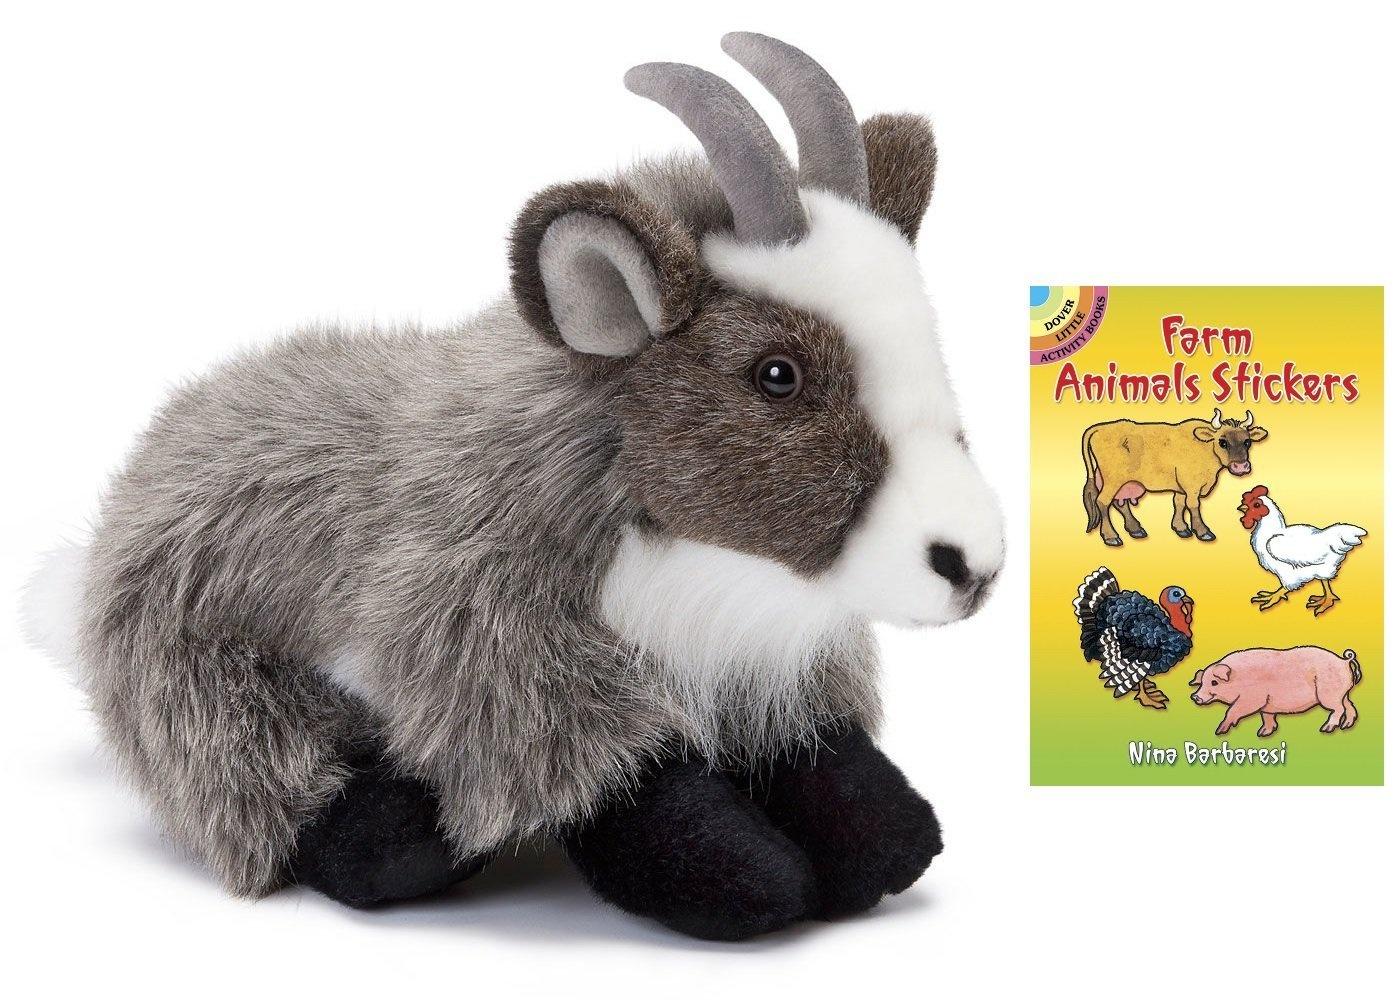 Nat & Jules Goat Large 29cm Plush Animal with Farm Animals Stickers